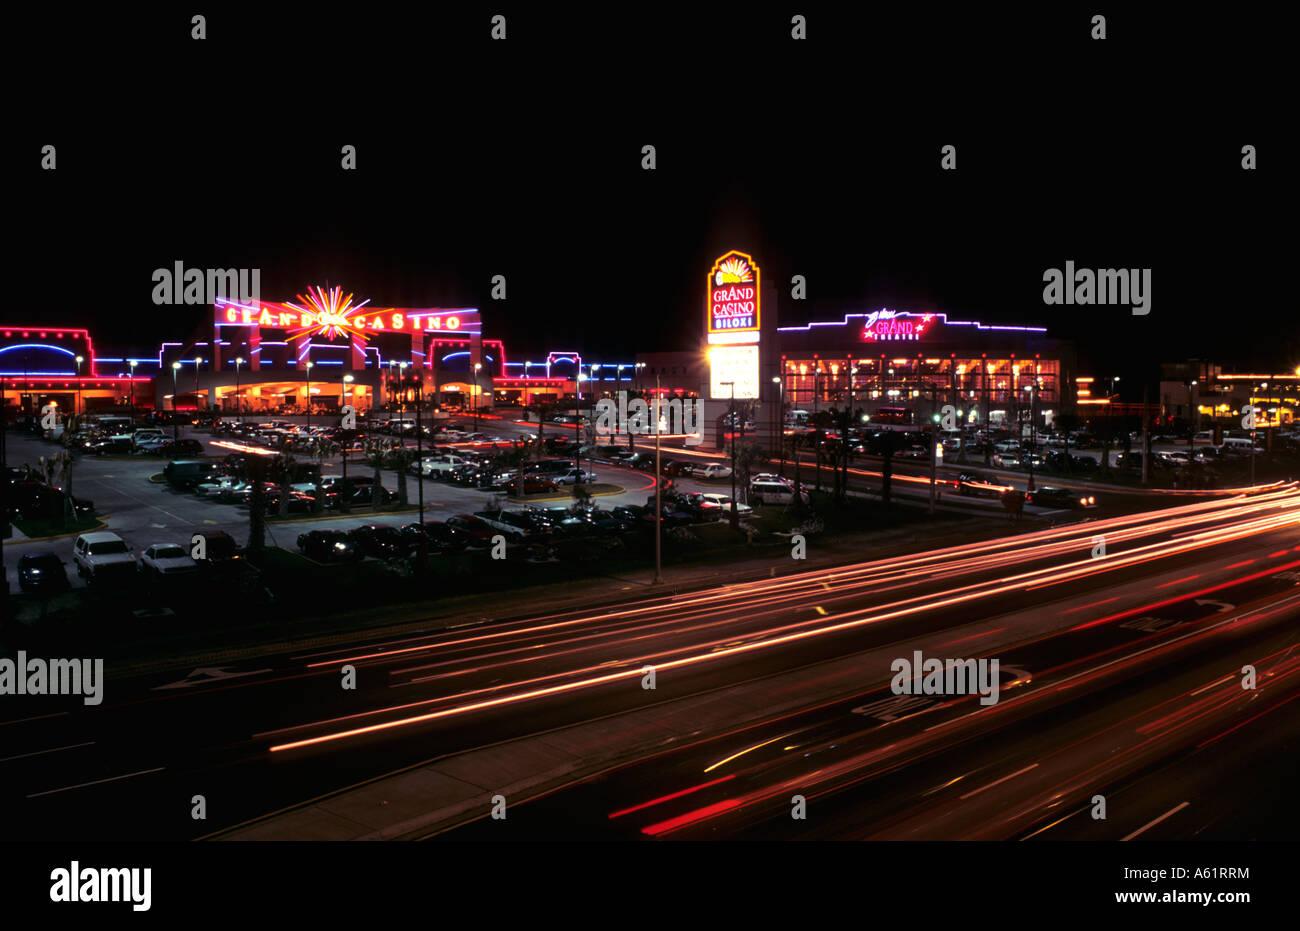 Mississippi gambling casinos gambling charities